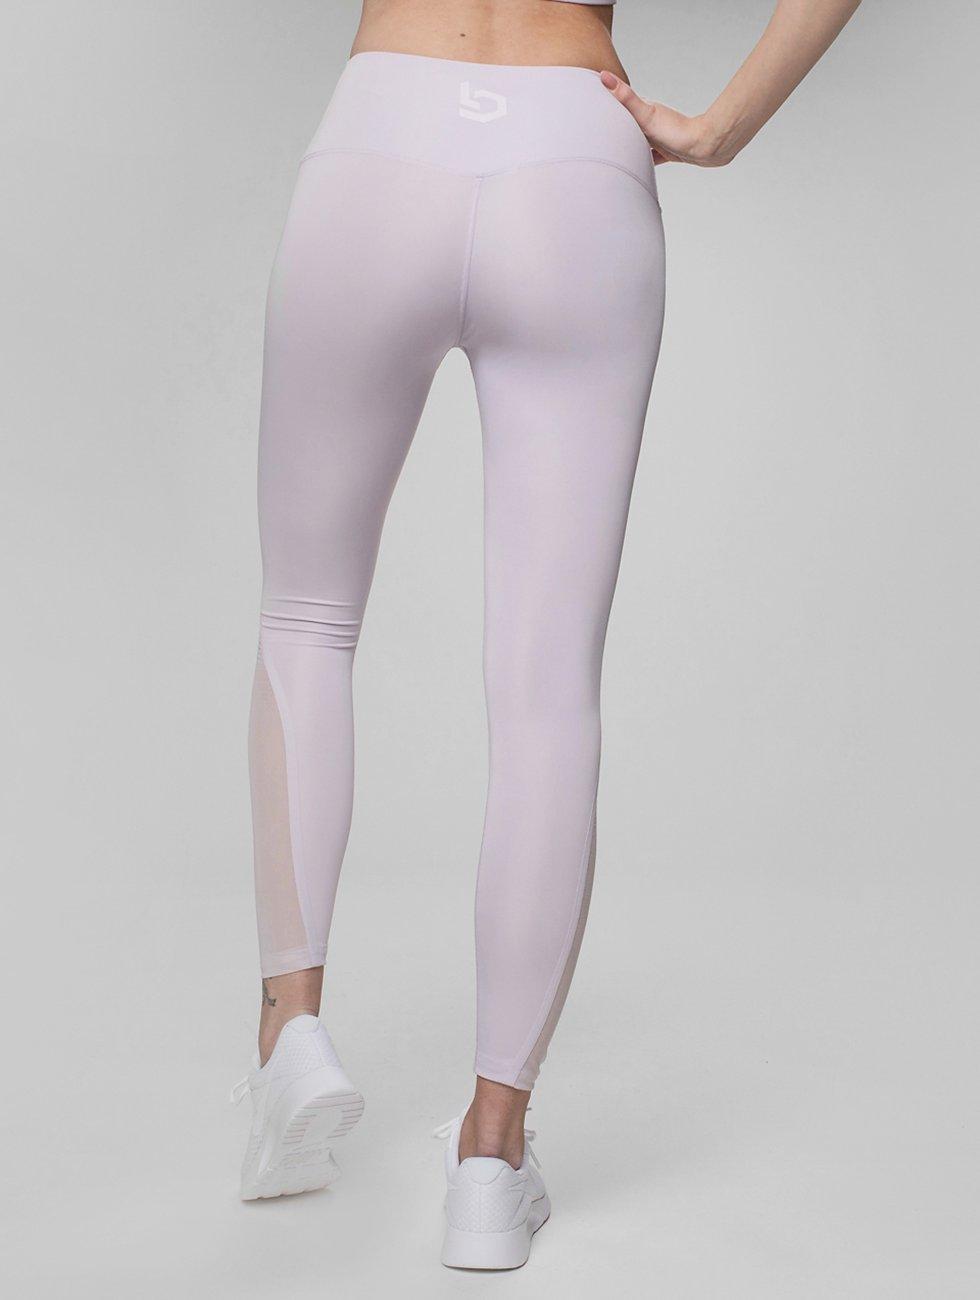 Beyond Limits Legging/Tregging Highlight púrpura